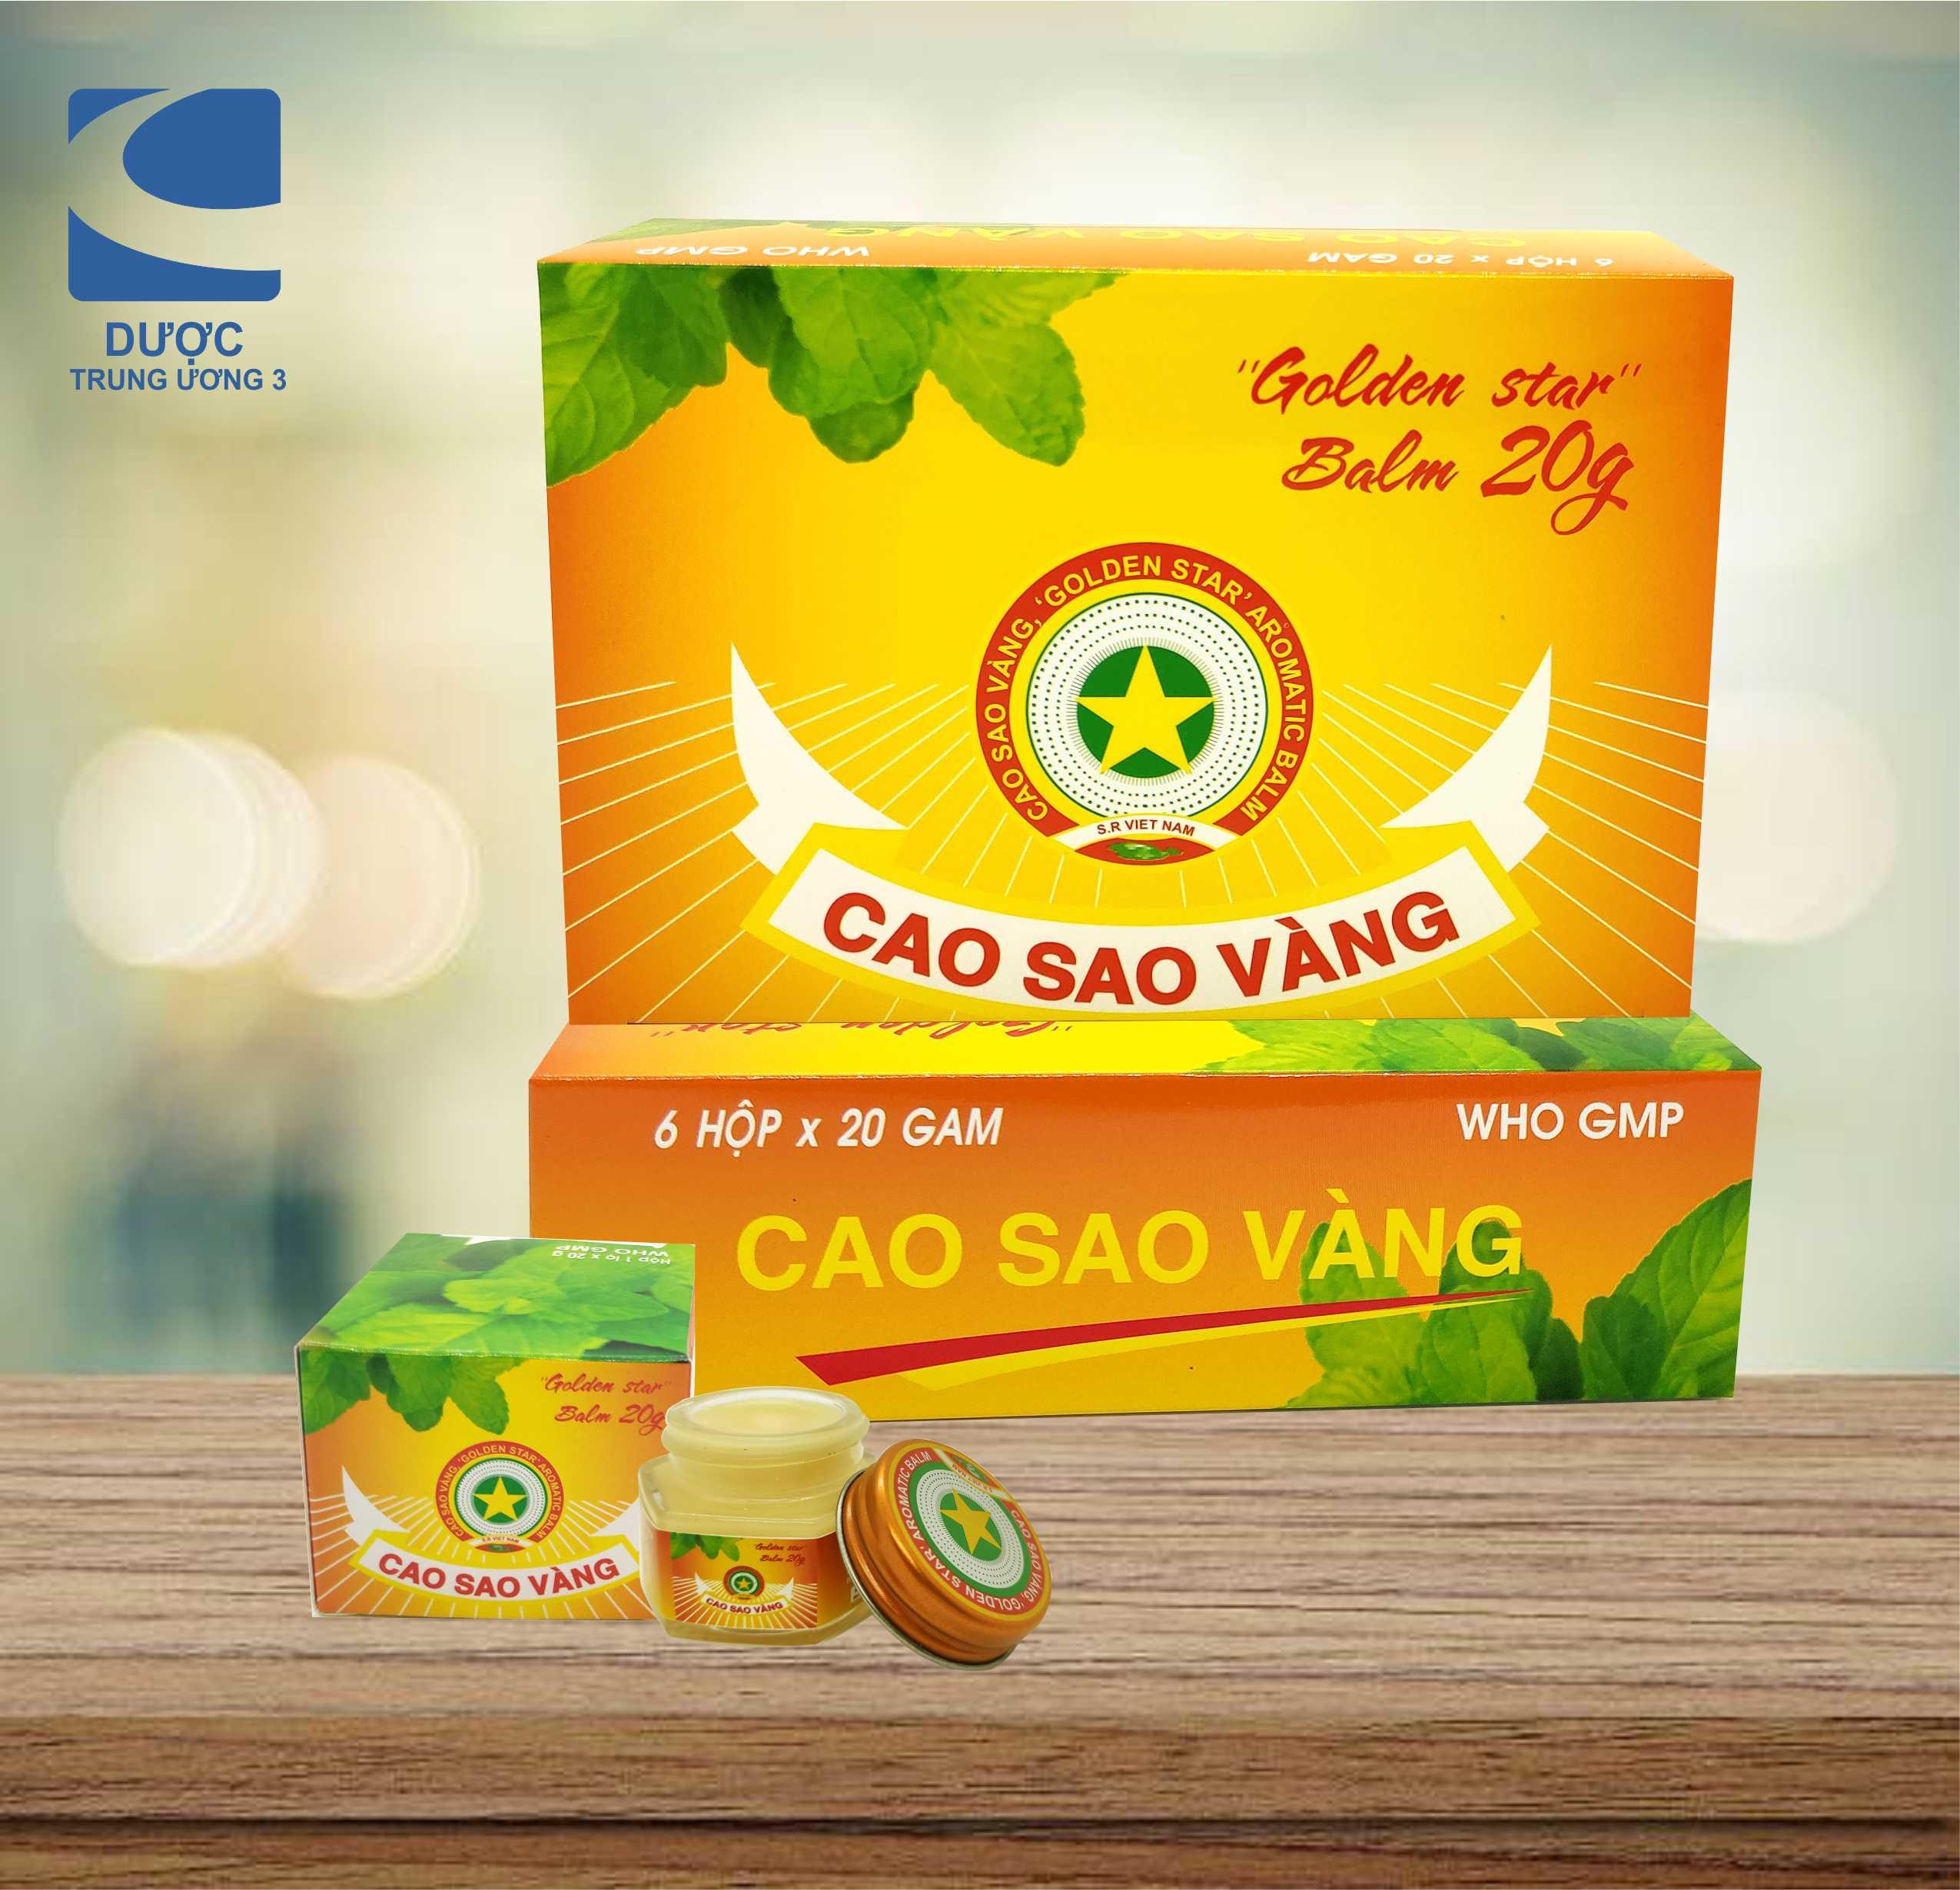 CAO SAO VÀNG 20g  - Golden star Balm